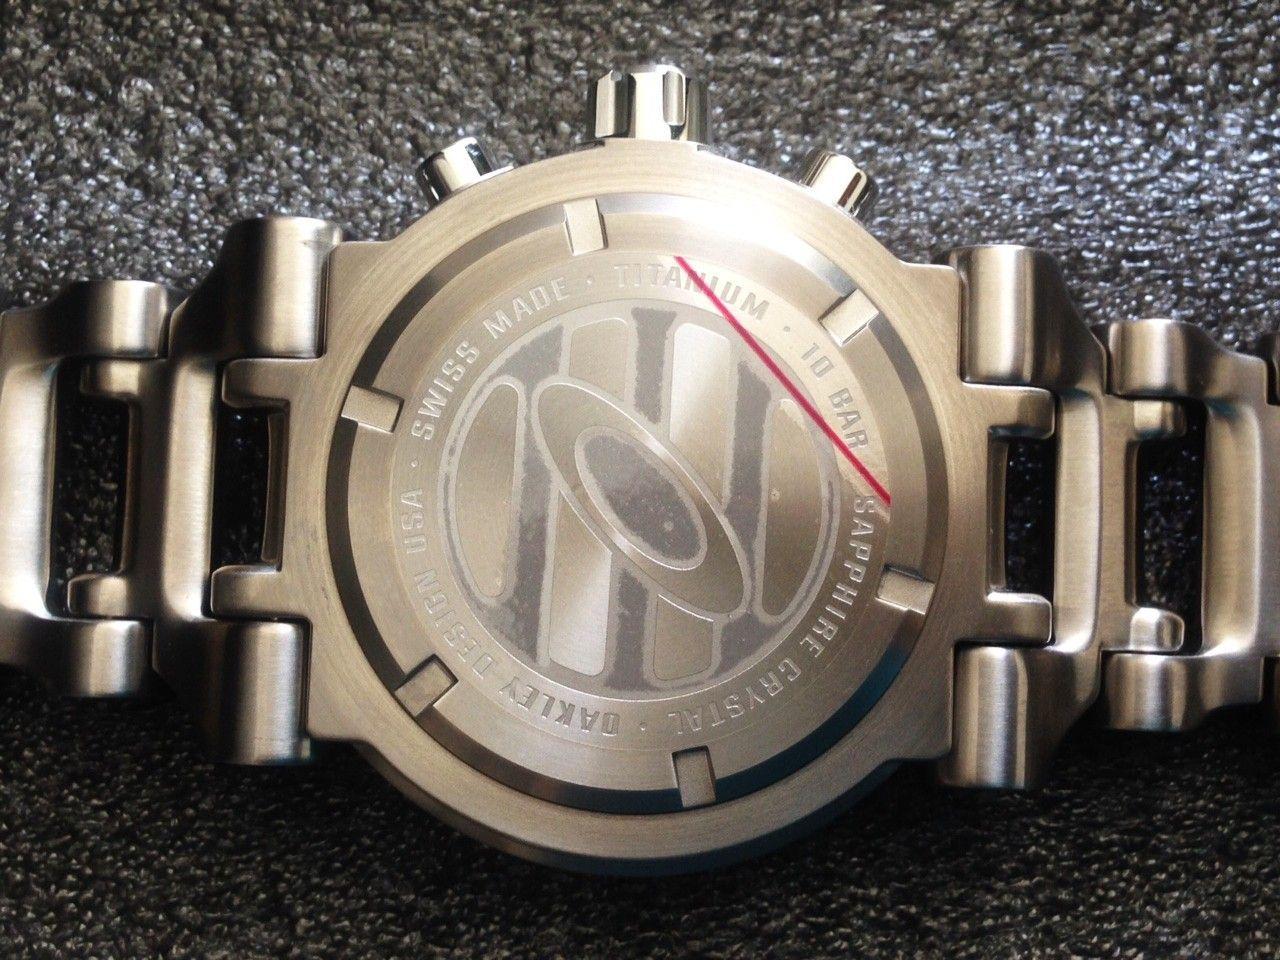 NEW IN BOX Oakley Hollow Point Titanium Watch White Dial 10-046 - 10.JPG